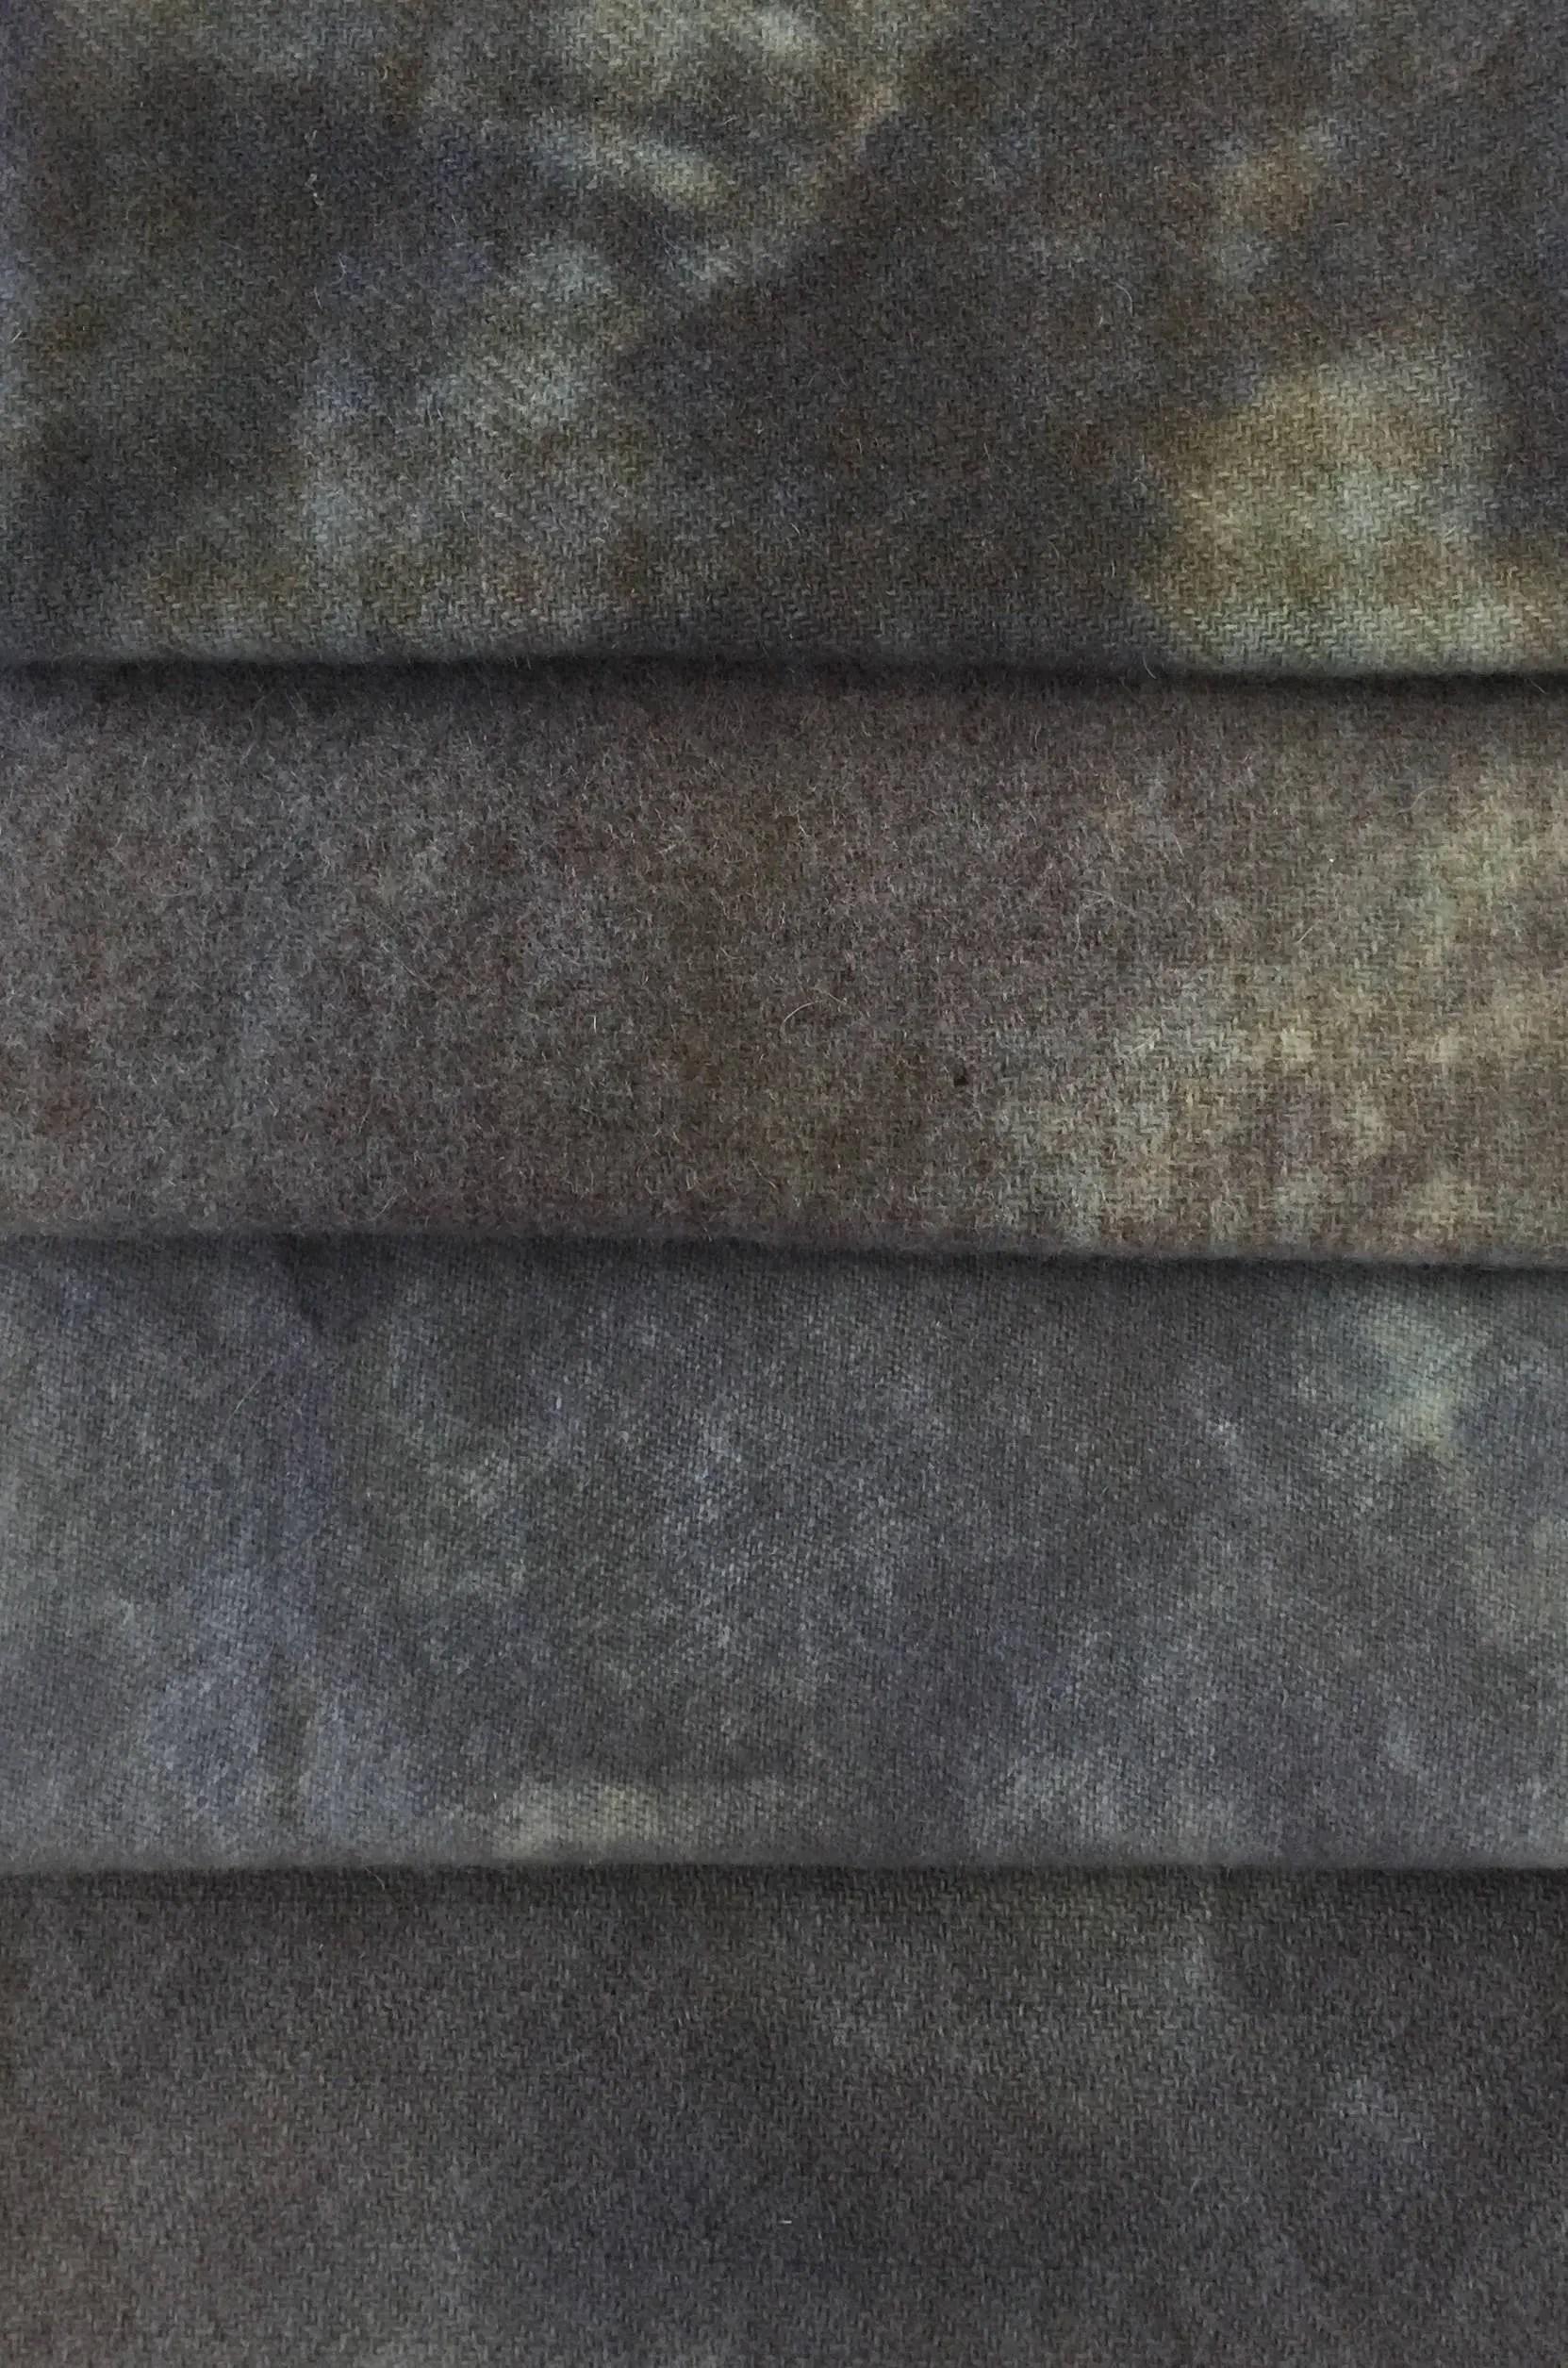 Primitive Upholstery Fabric Yard